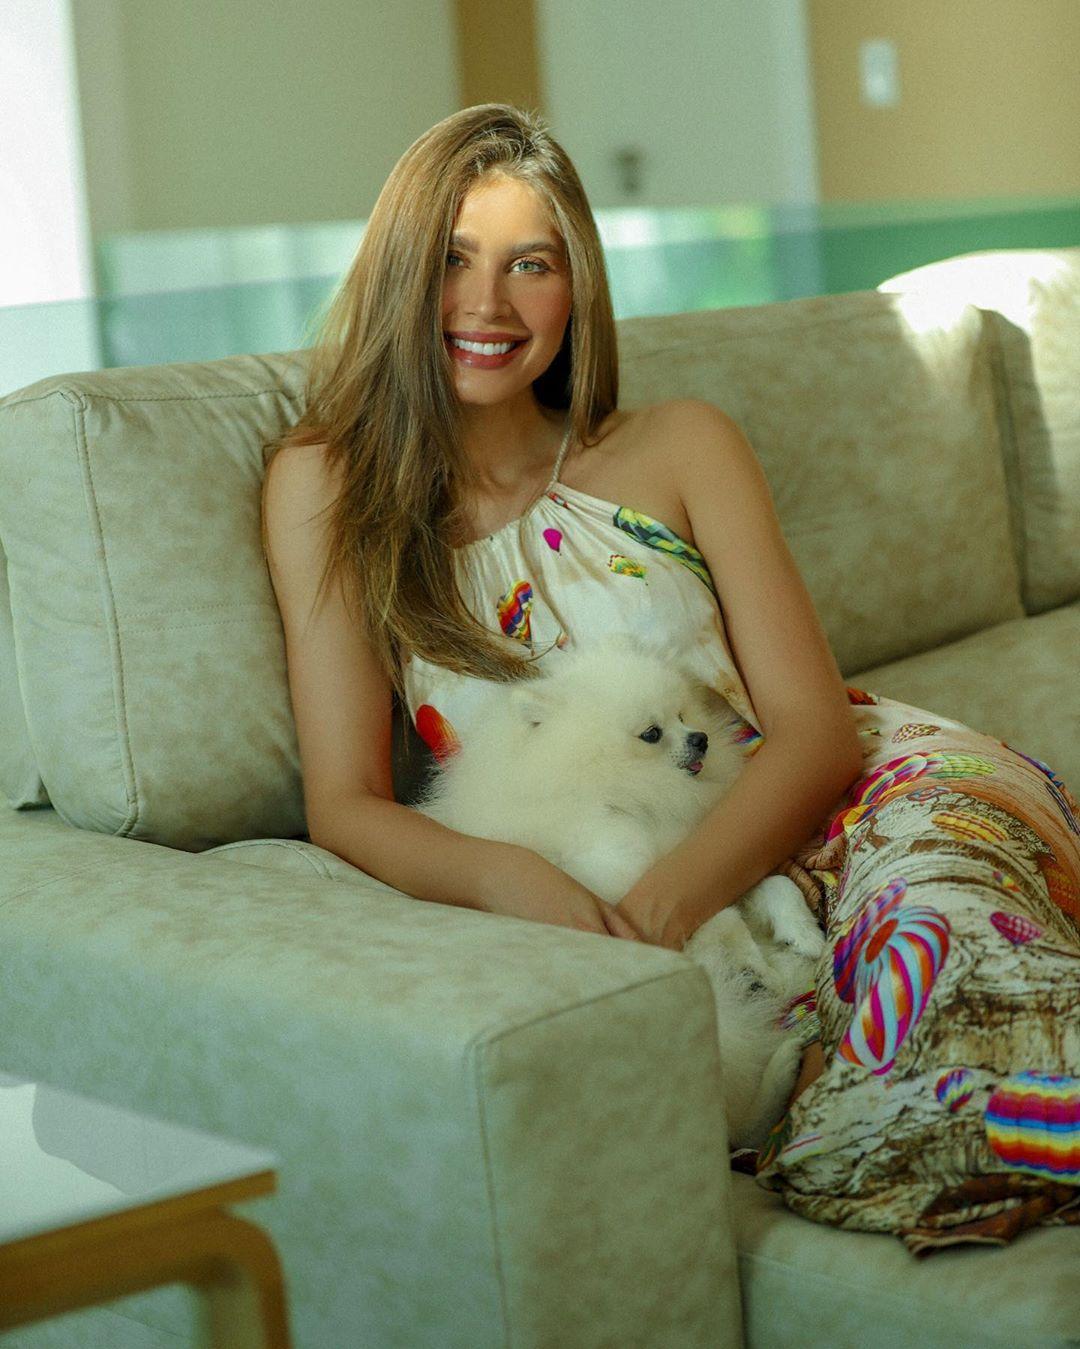 gabriele marinho, miss teen world 2012/top 5 de miss brasil mundo 2013/top 5 de miss brasil universo 2016. - Página 2 99042510